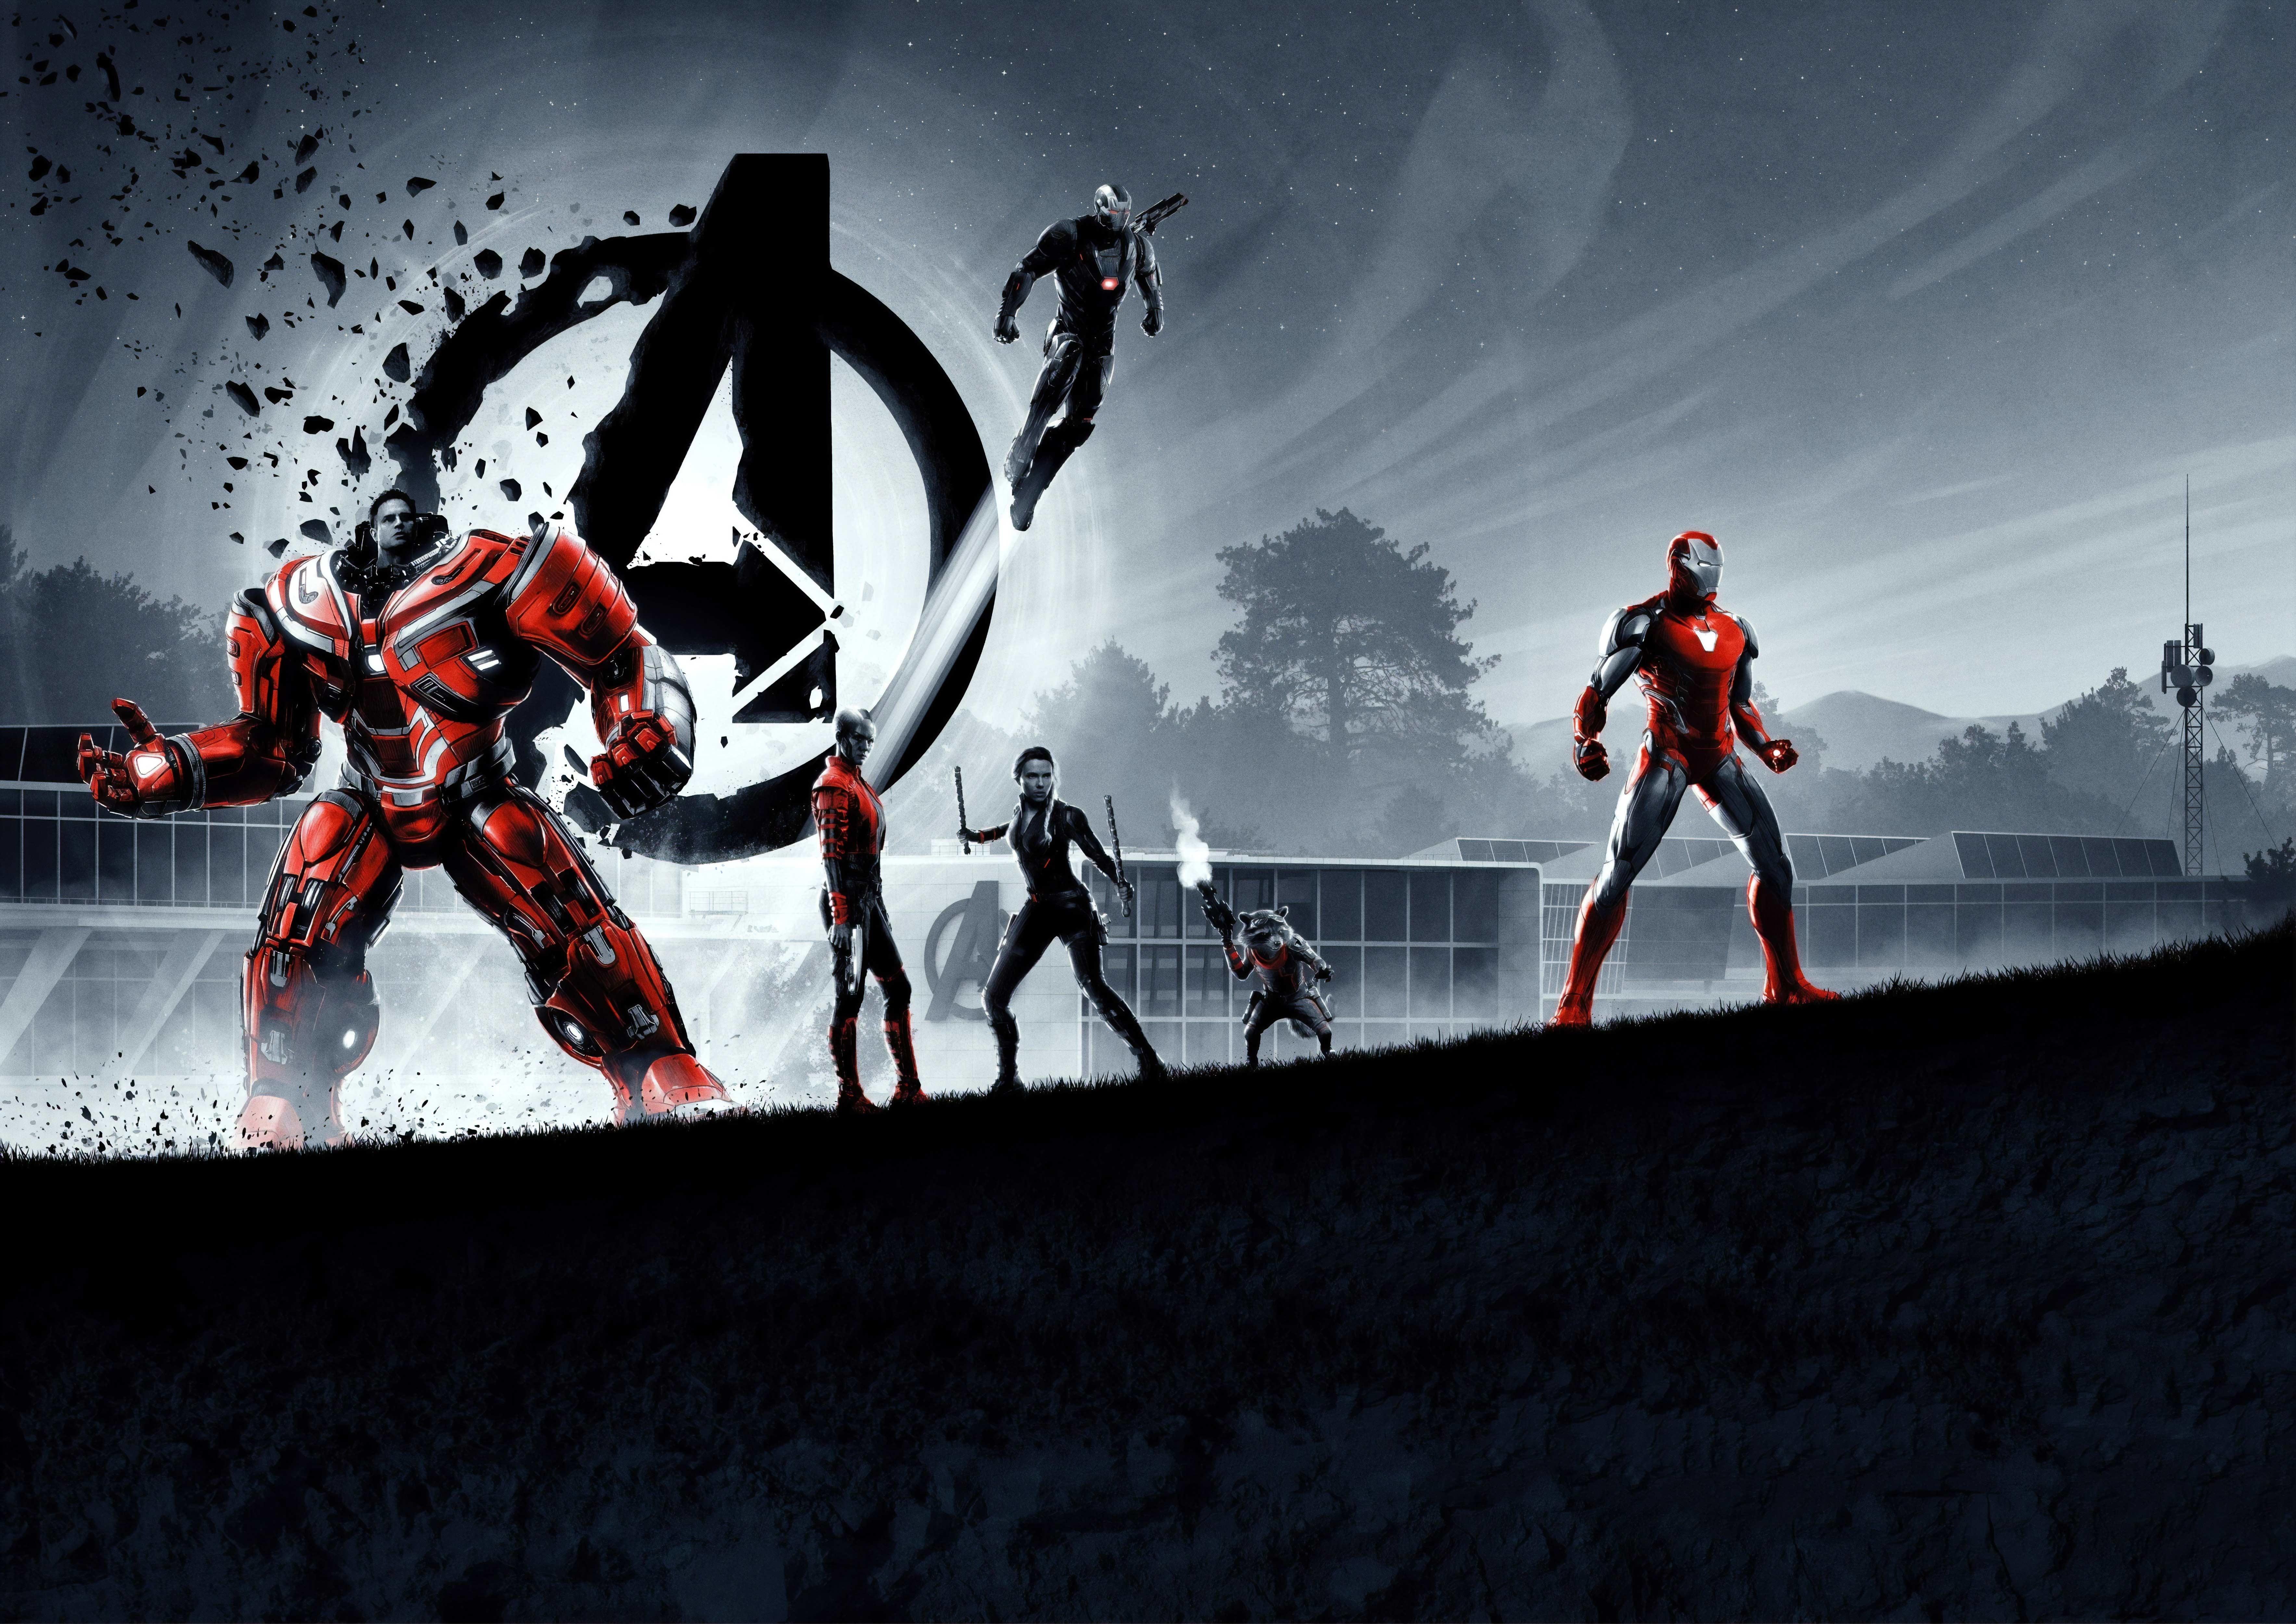 Avengers Endgame 8k Wallpaper Hd Movies 4k Wallpapers